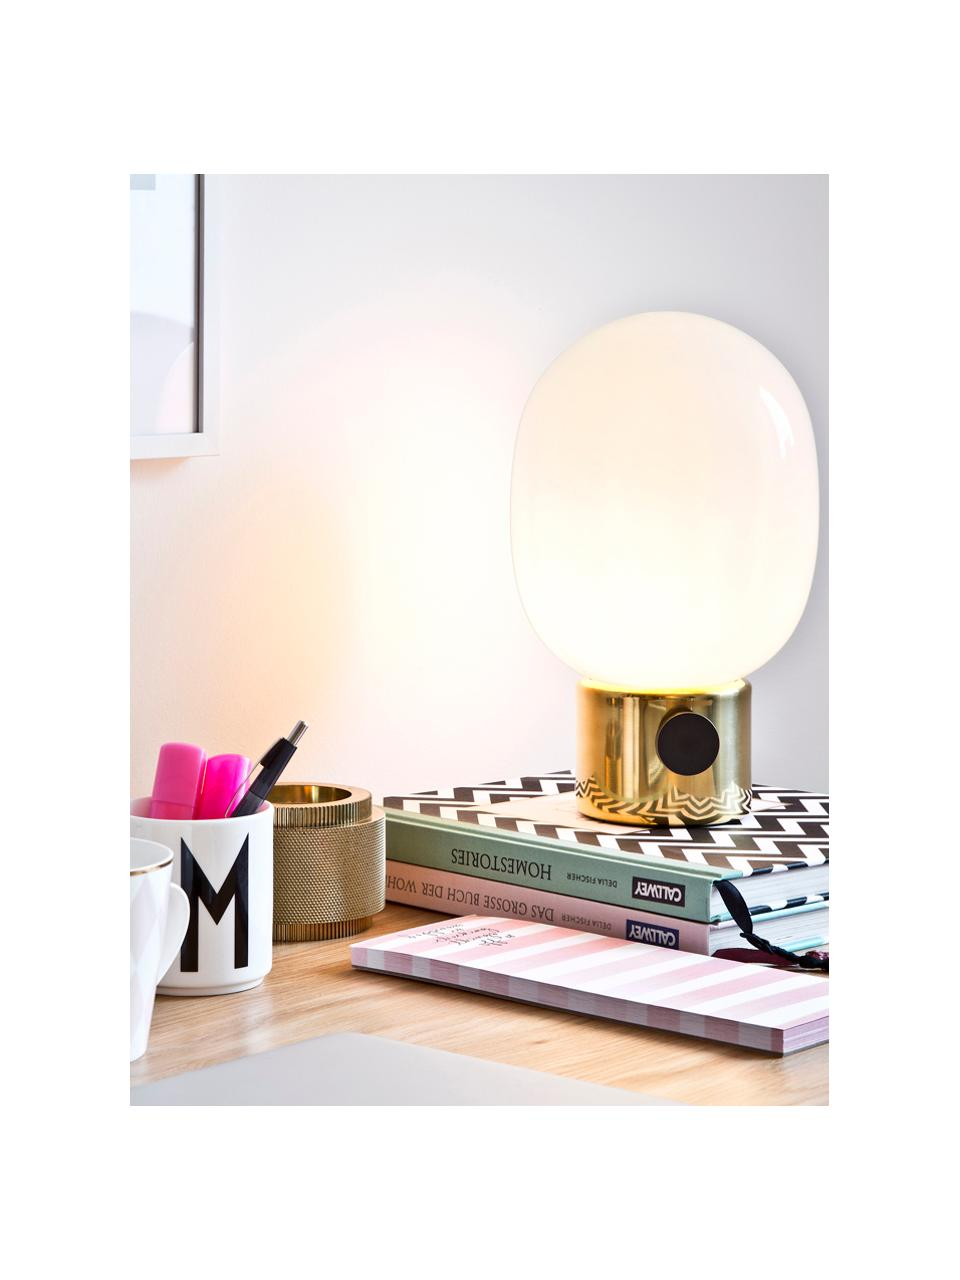 Klein dimbaar nachtlampje Mine van glas, Lampvoet: messing, staal, gepolijst, Lampenkap: glas, Lampvoet: messingkleurig, gepolijst staalkleurig. Lampenkap: wit, Ø 17 x H 29 cm